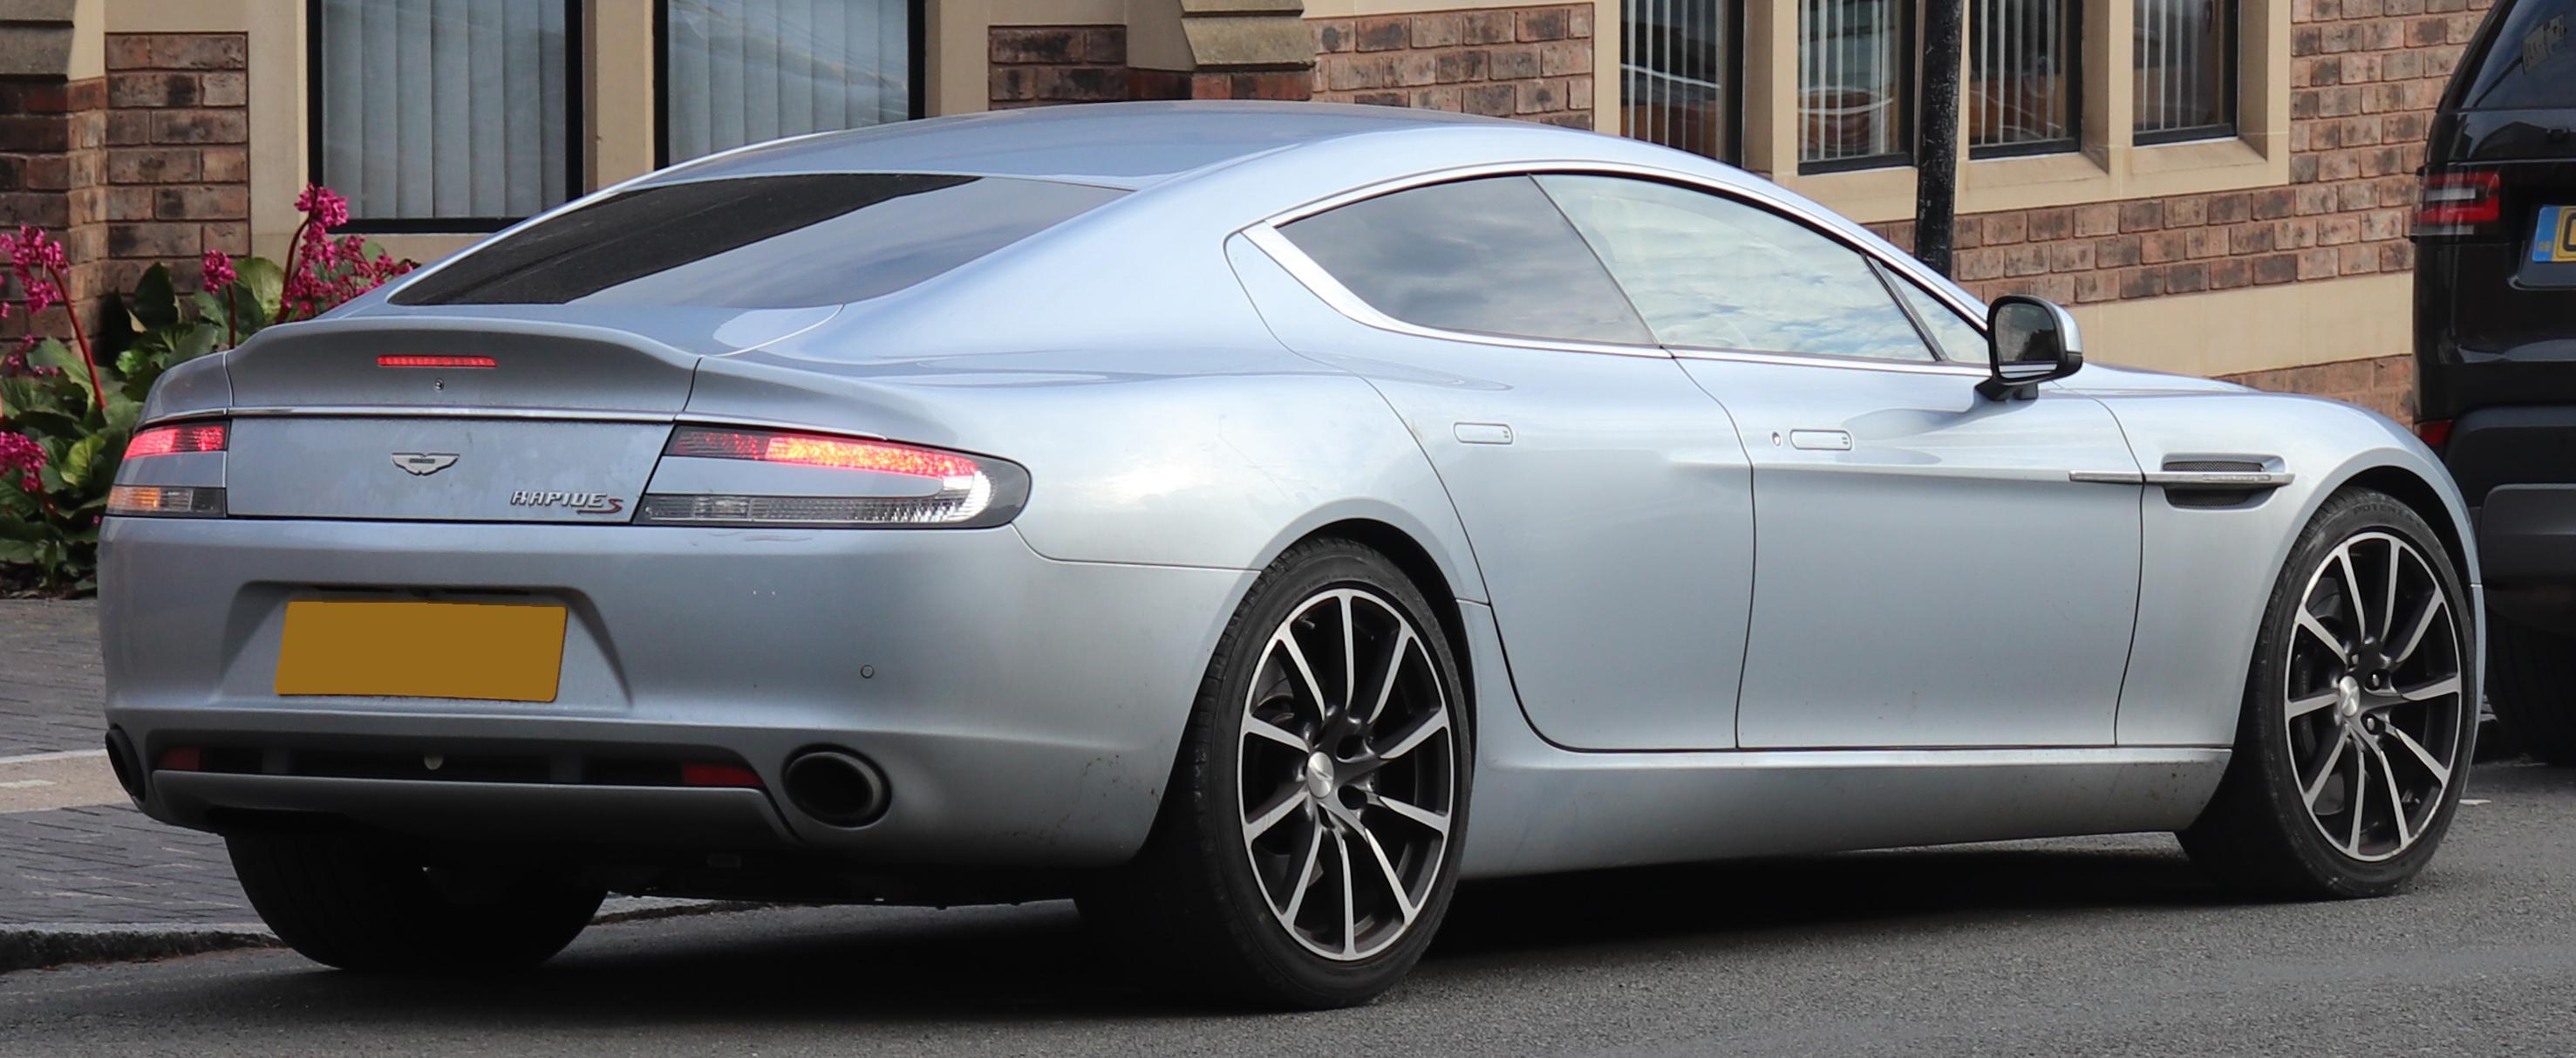 File 2016 Aston Martin Rapide S V12 Automatic 6 0 Rear Jpg Wikimedia Commons